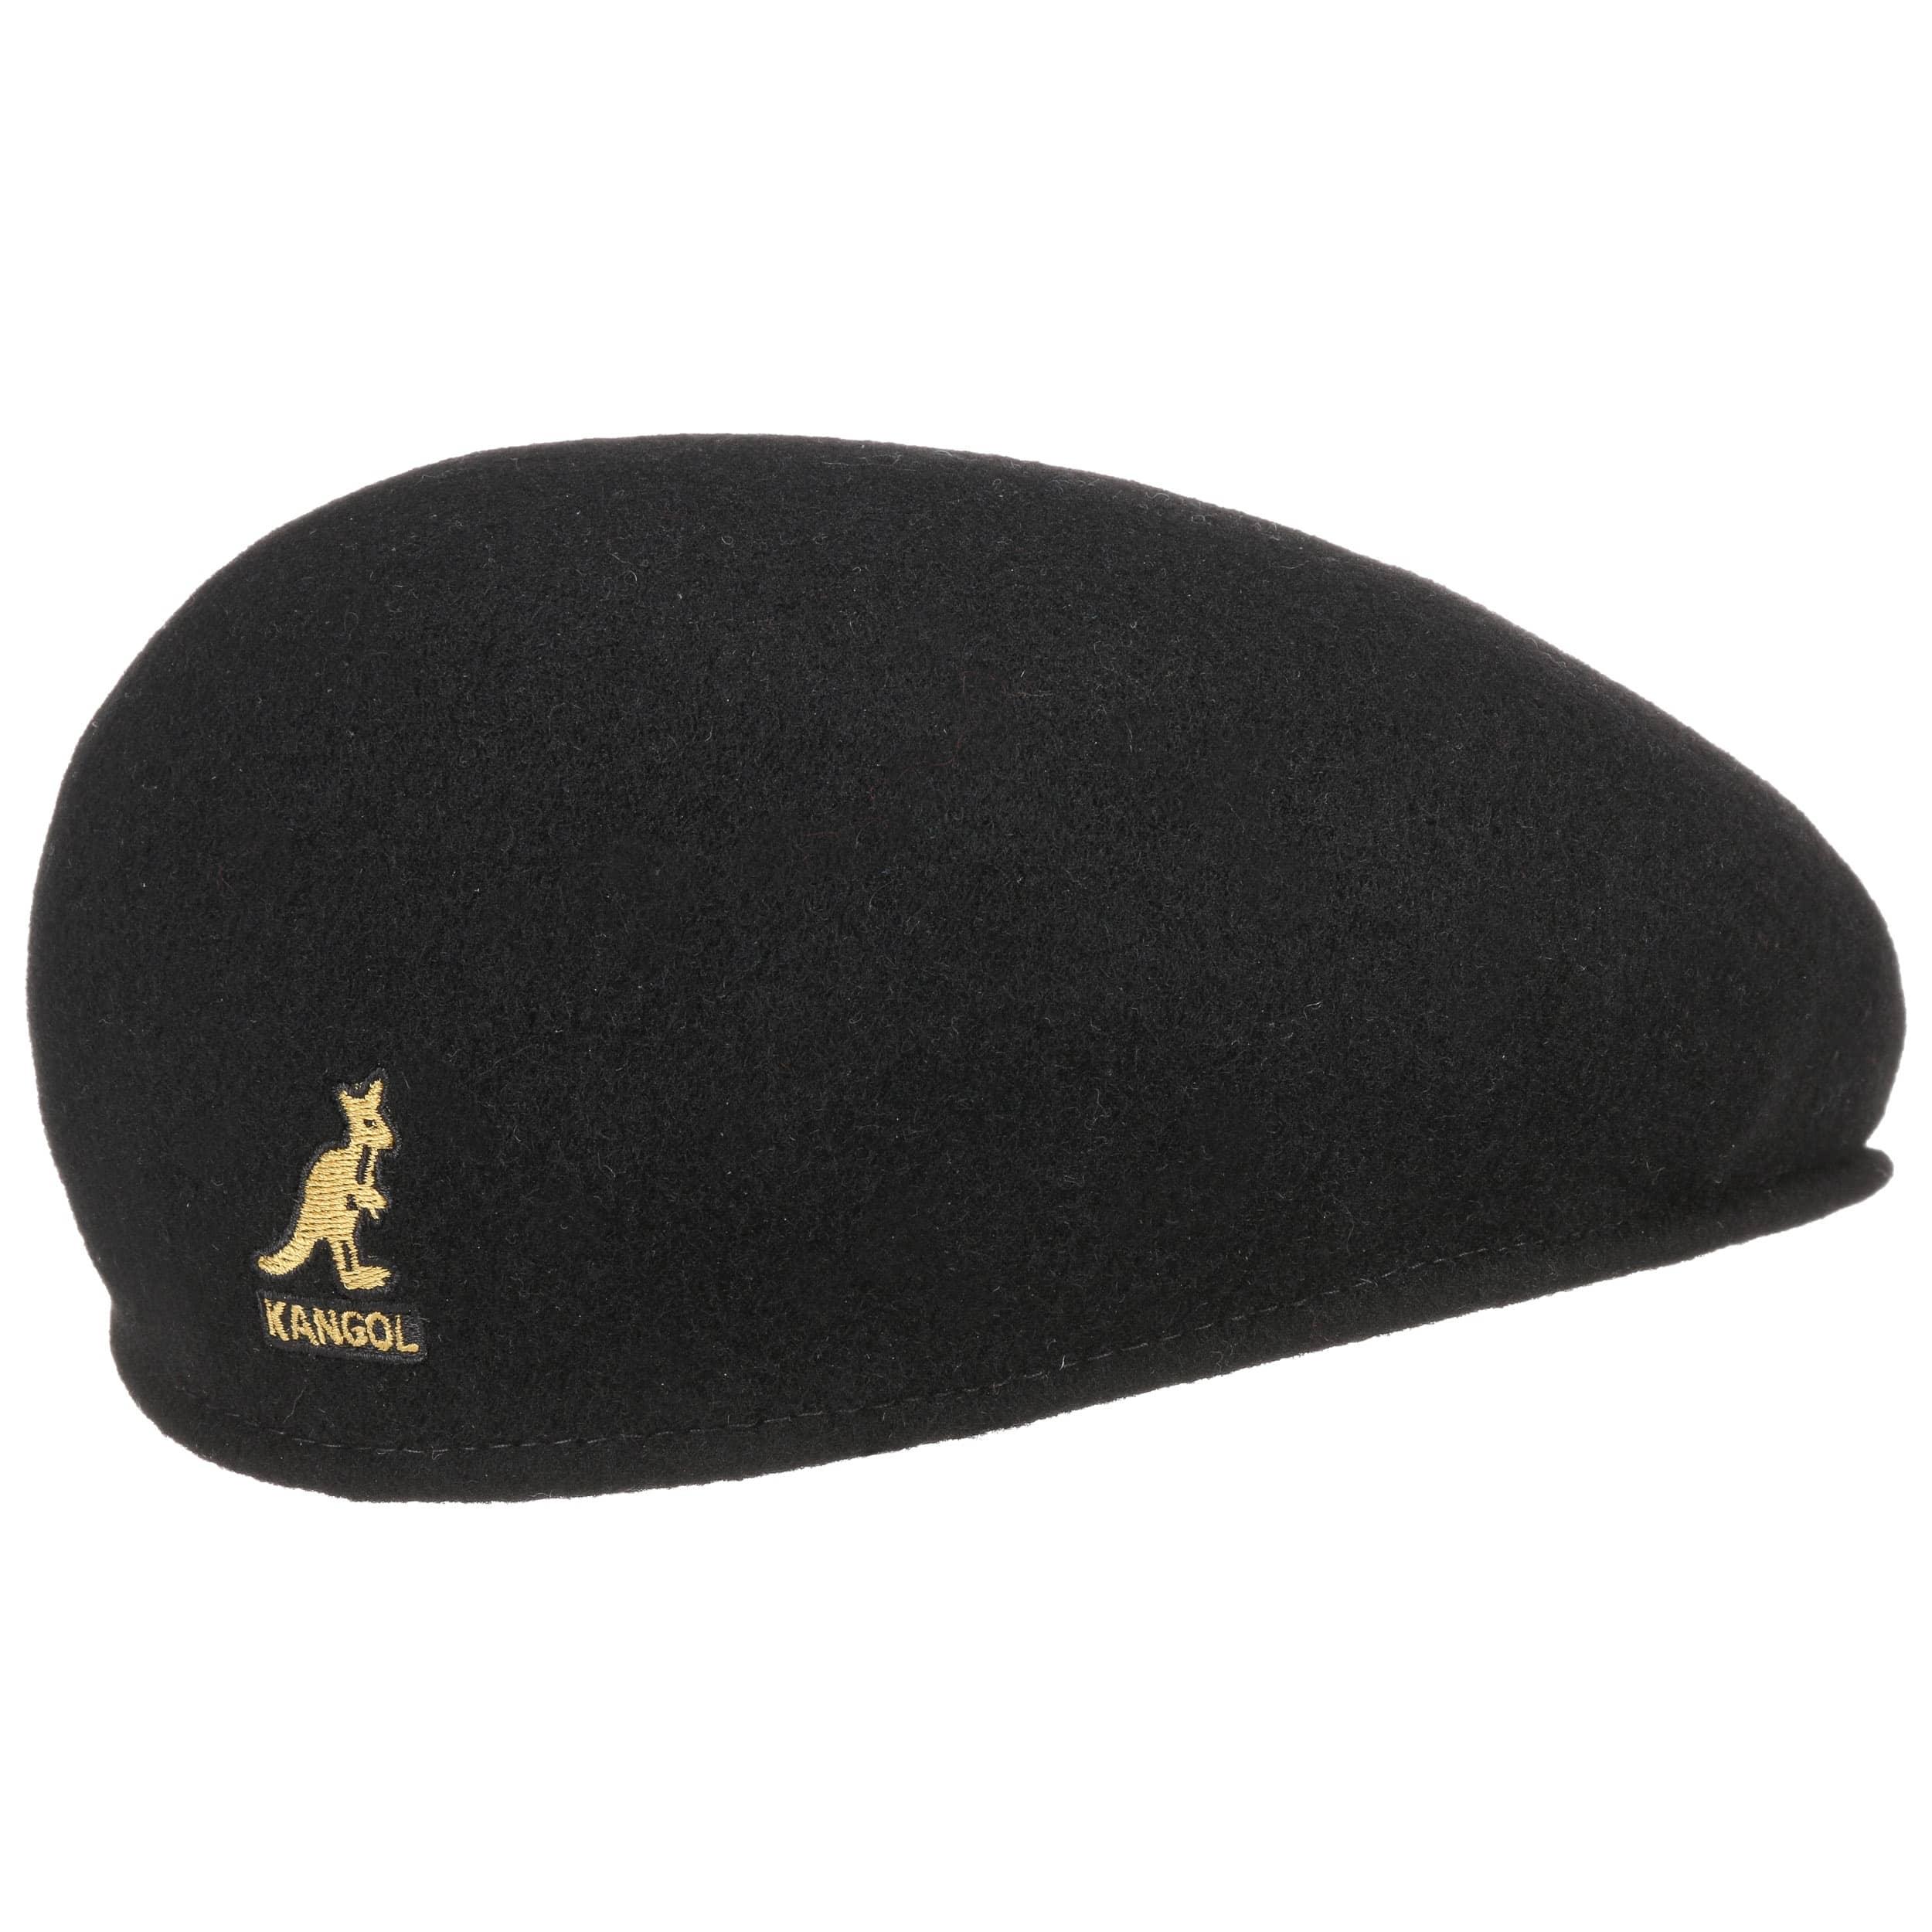 e782761dc7 ... Original 504 Black Gold Flat Cap by Kangol - black 3 ...